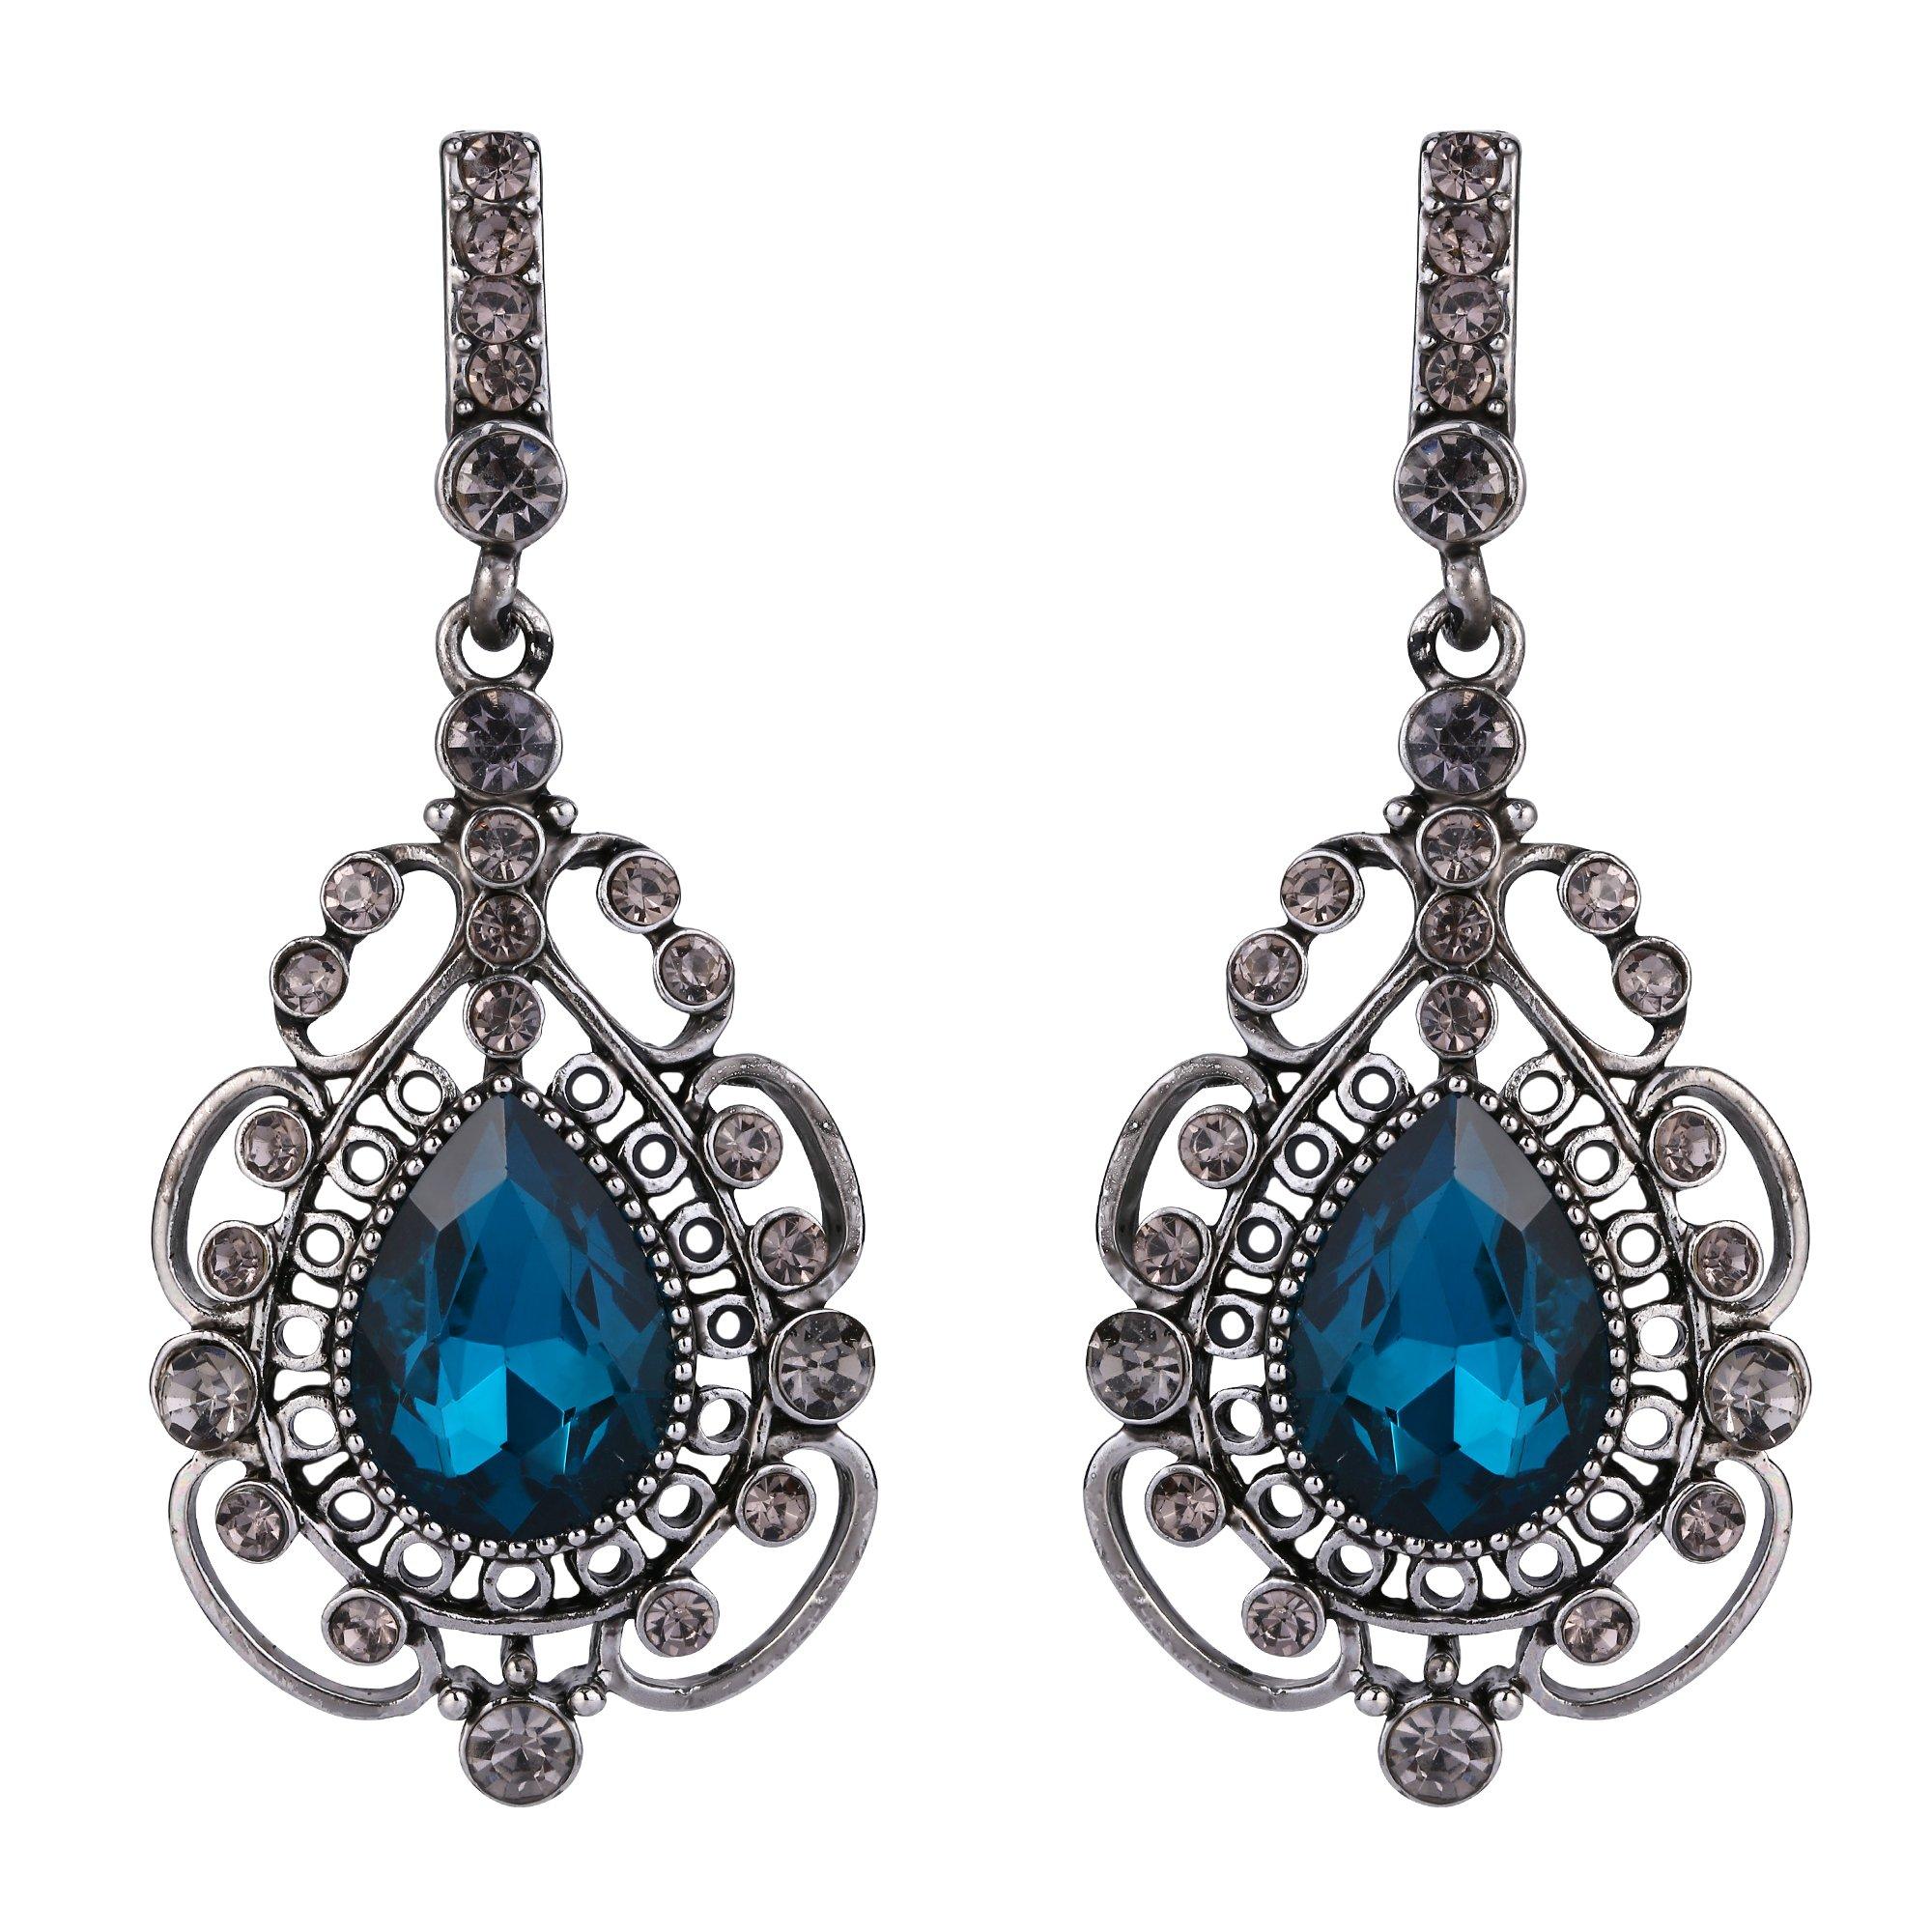 BriLove Women's Vintage Inspired Crystal Floral Hollow Teardrop Chandelier Dangle Earrings London Blue Topaz Color w/Grey Antique Silver-Tone